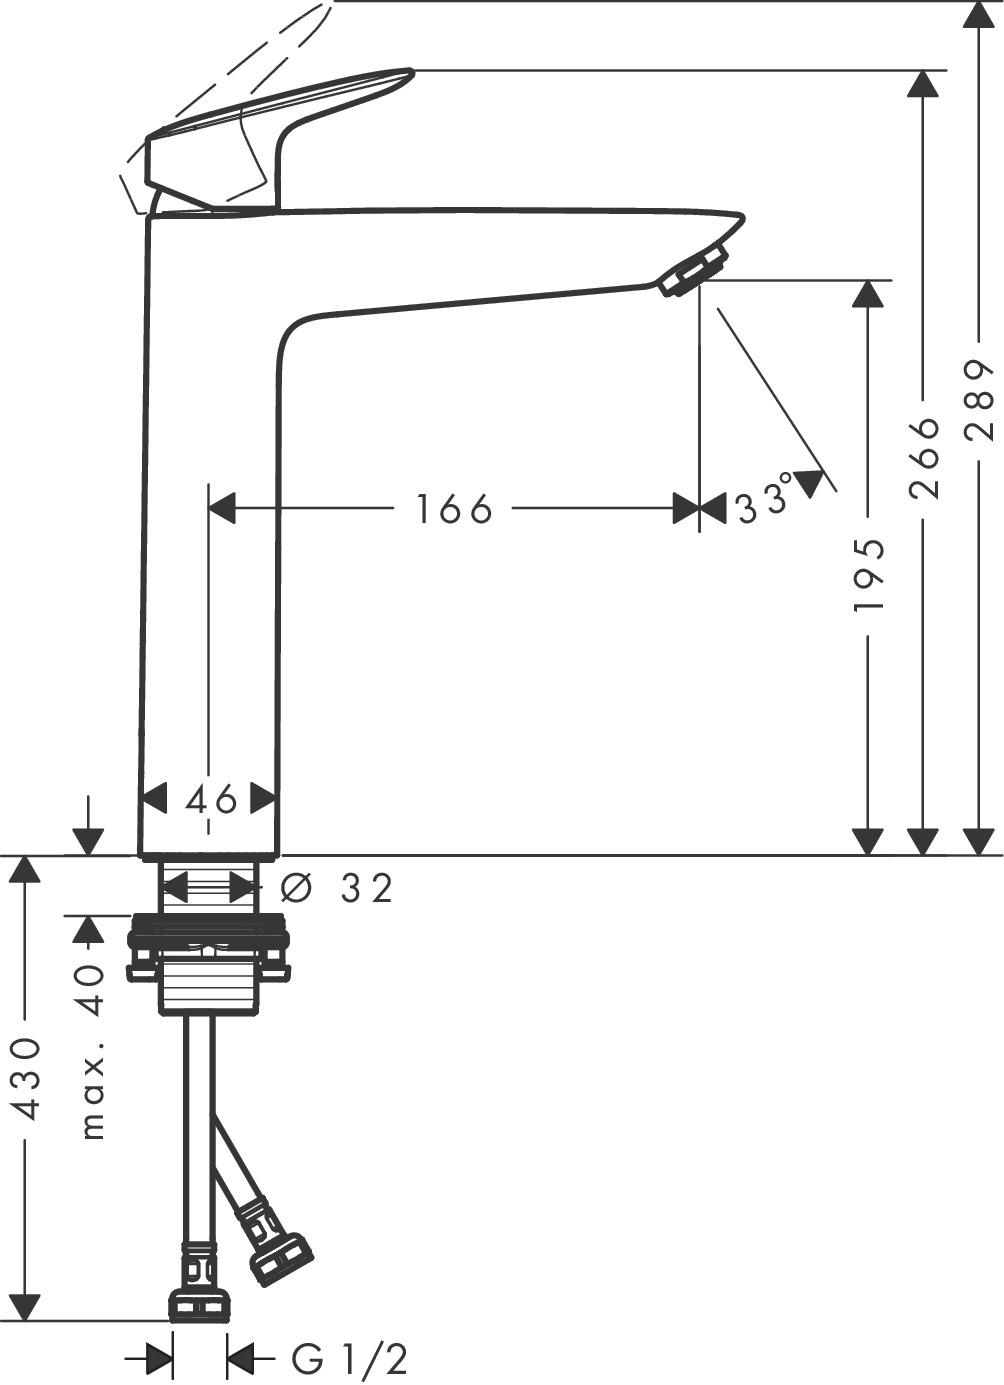 Logis Washbasin mixers: Chrome, Item No. 71091003